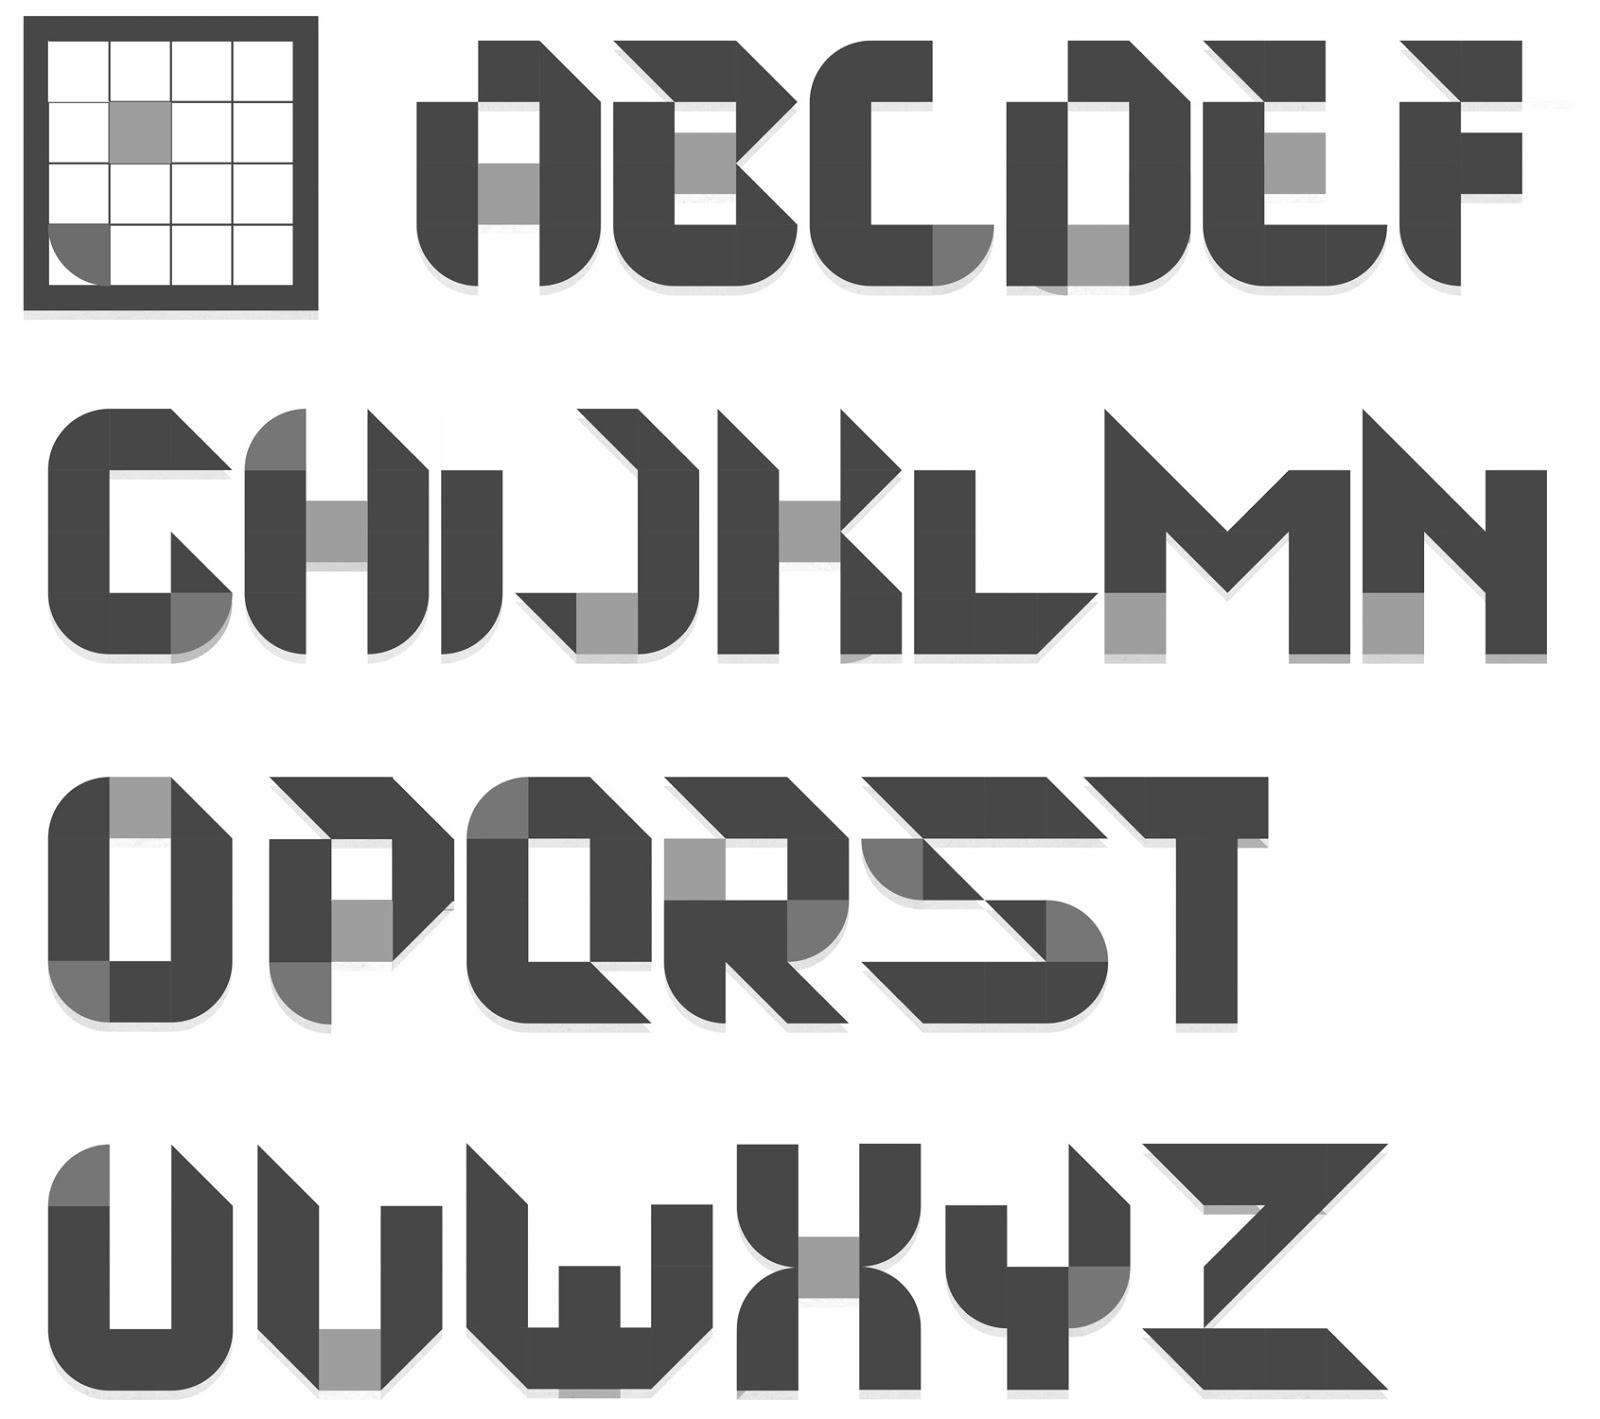 esta tipografa es un poco mas informal que pretende imitar la tipografa manual